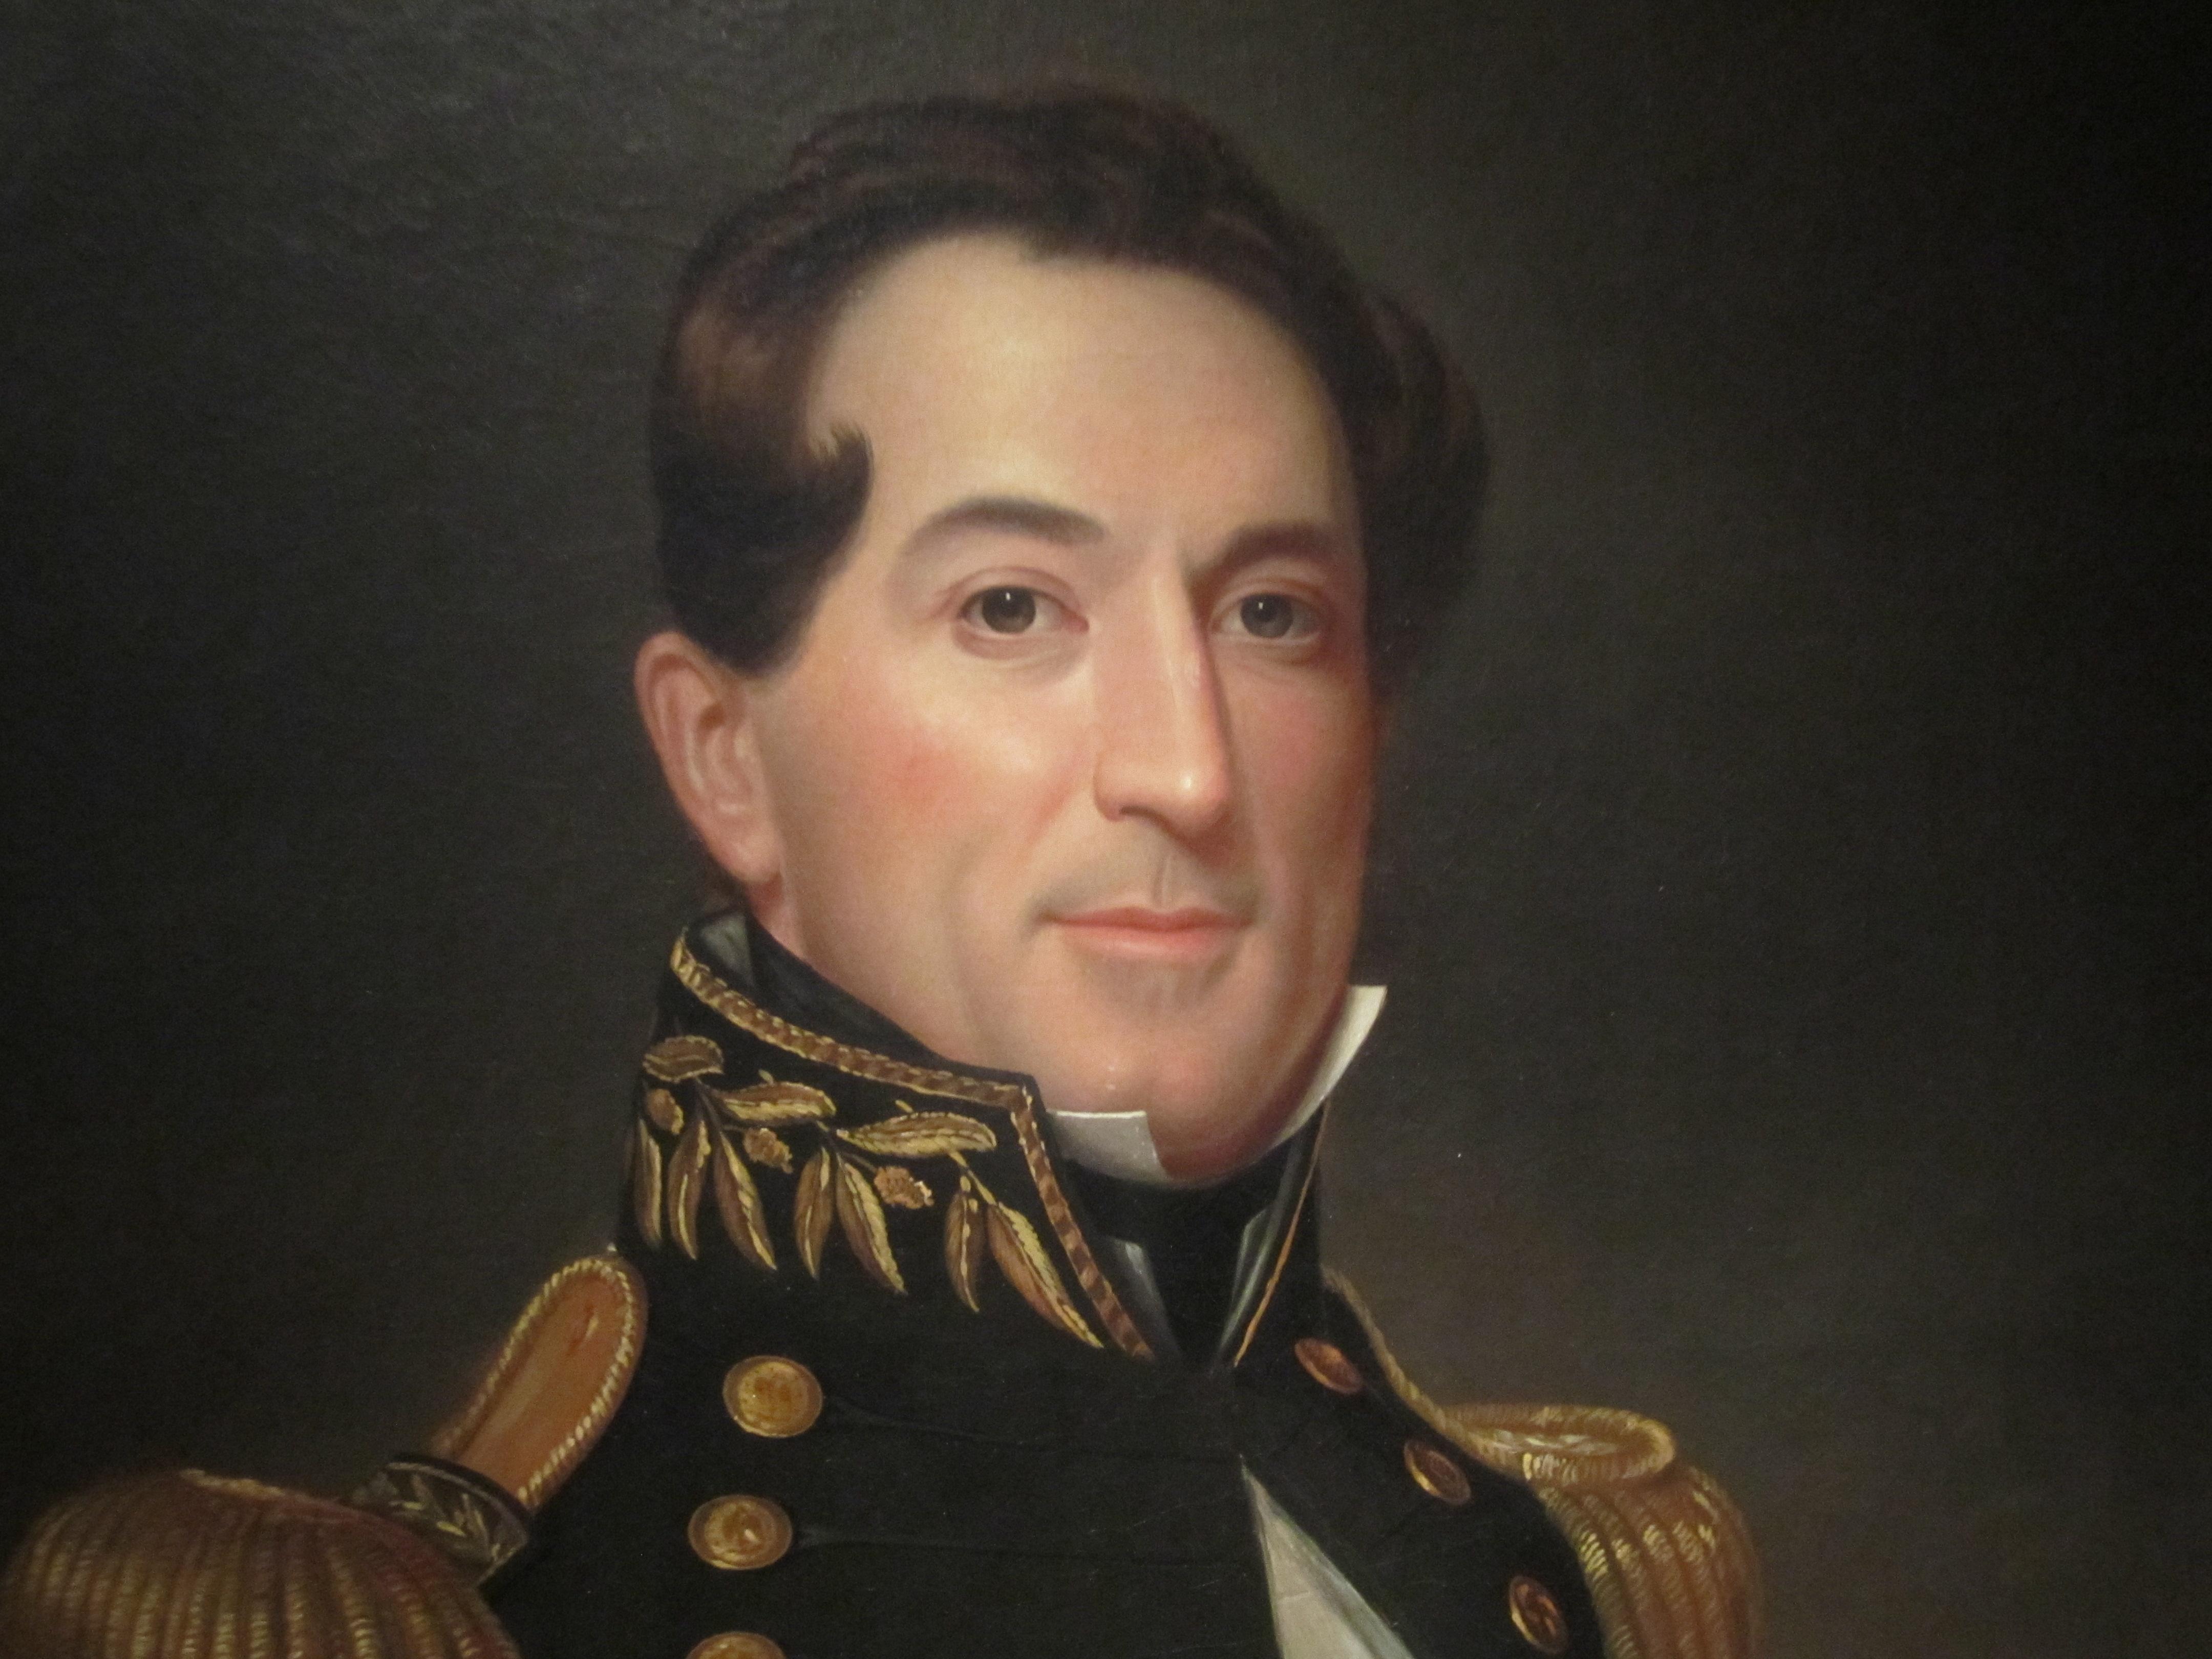 Admiral Farragut photo